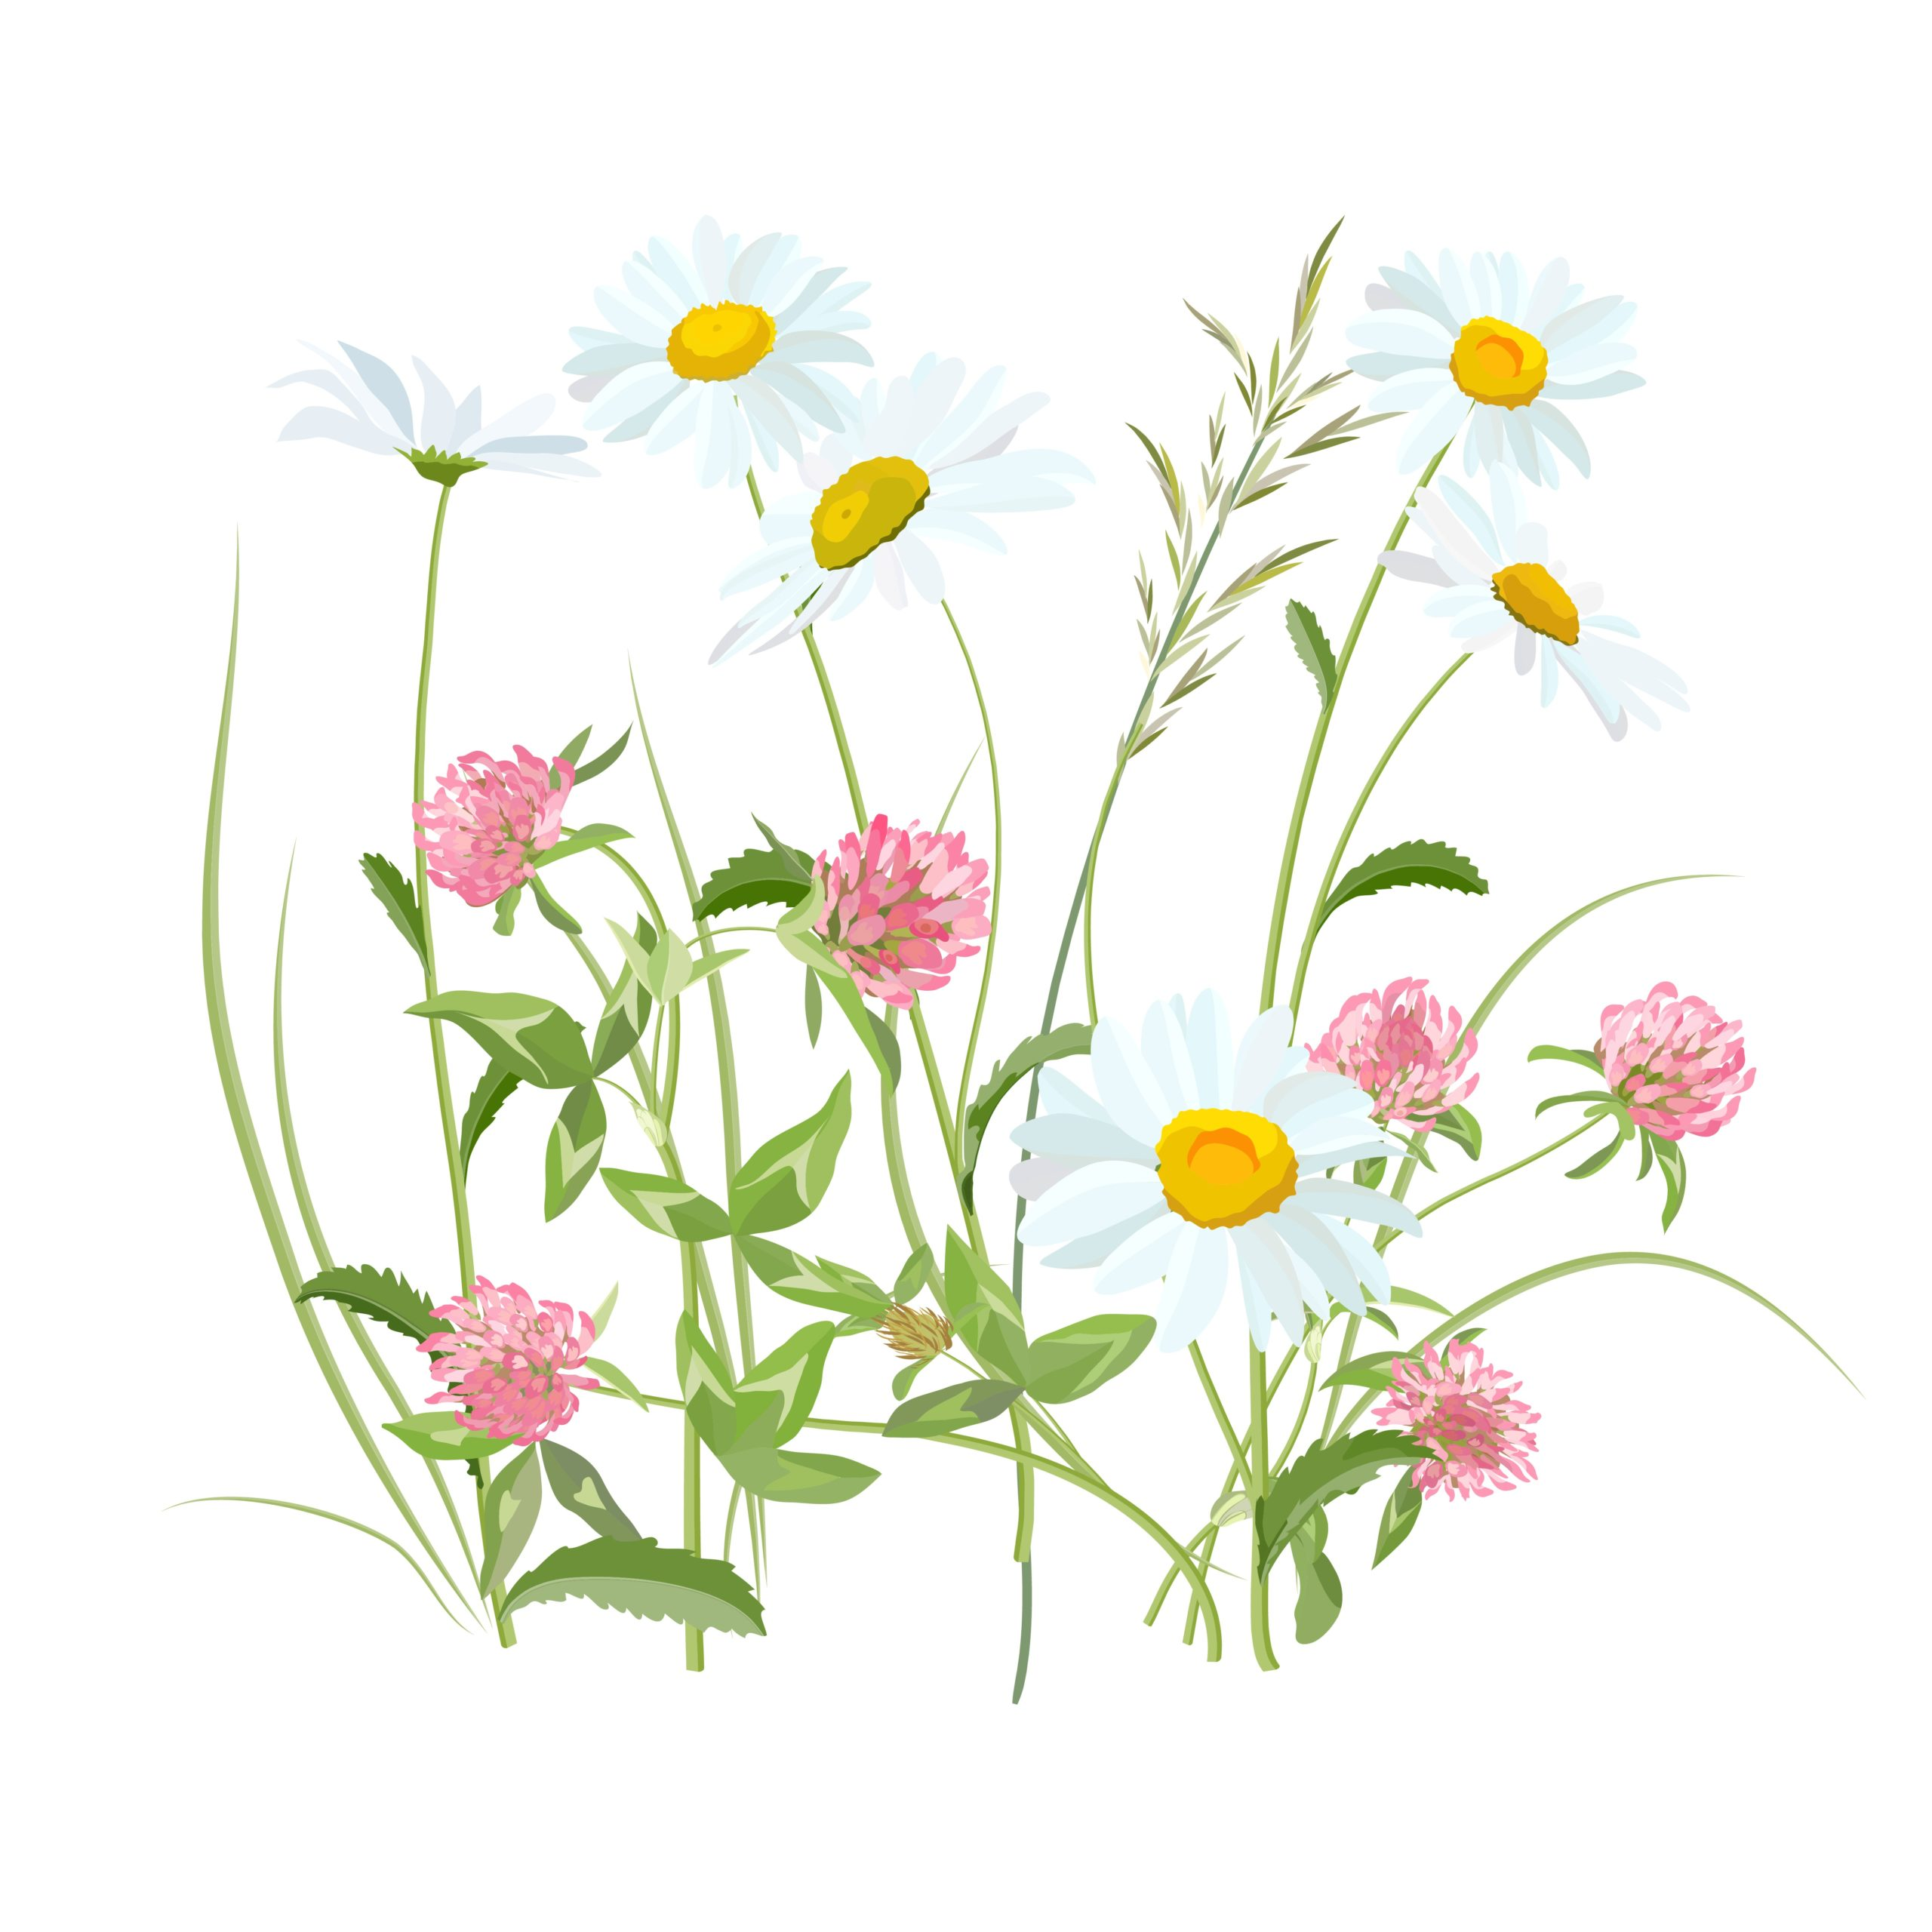 flowers-2082495